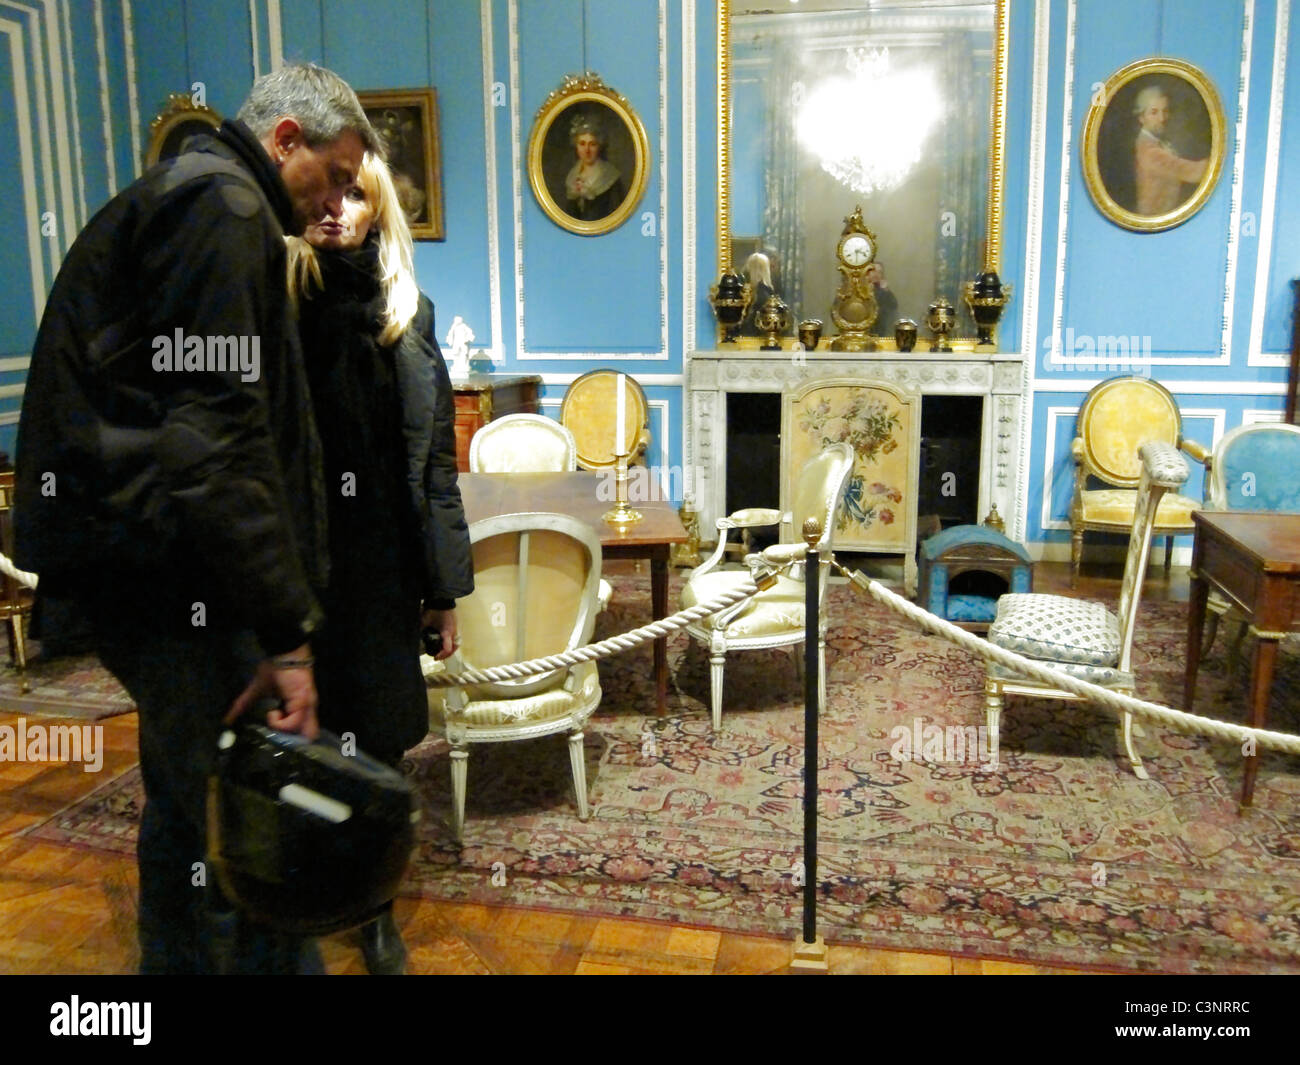 Paris, France, Couple Visiting 'Musee Carnavalet', 'Musee de l'Histoire', City of Paris Museum, - Stock Image